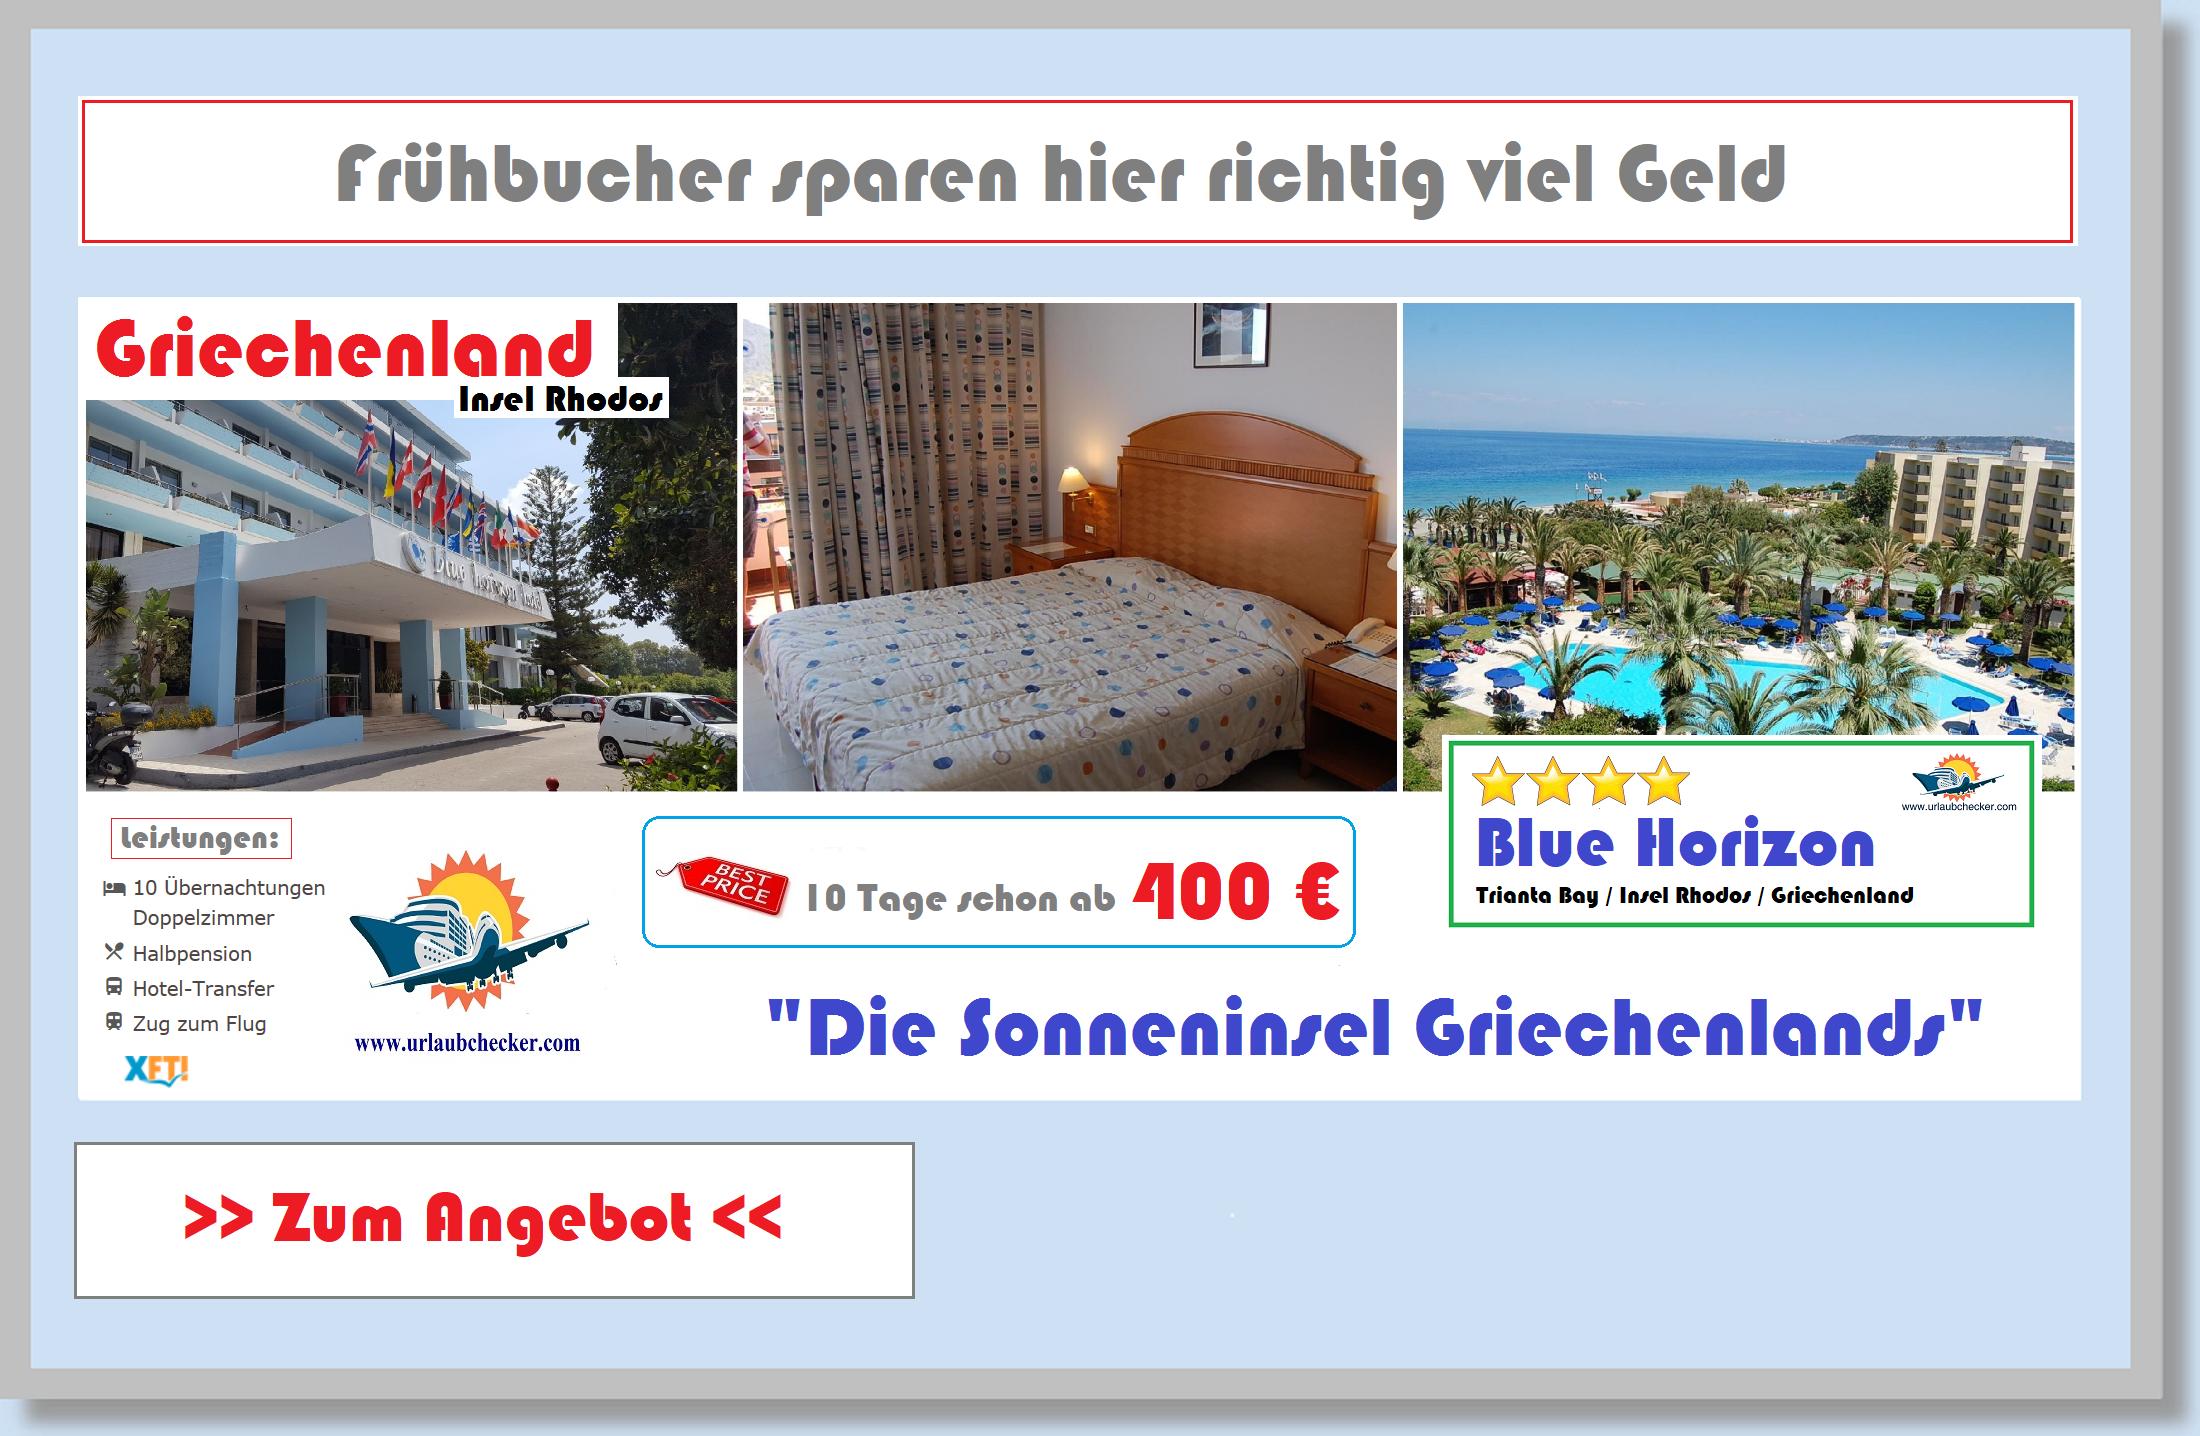 Hotel Blue Horizon Insel Rhodos Urlaubchecker